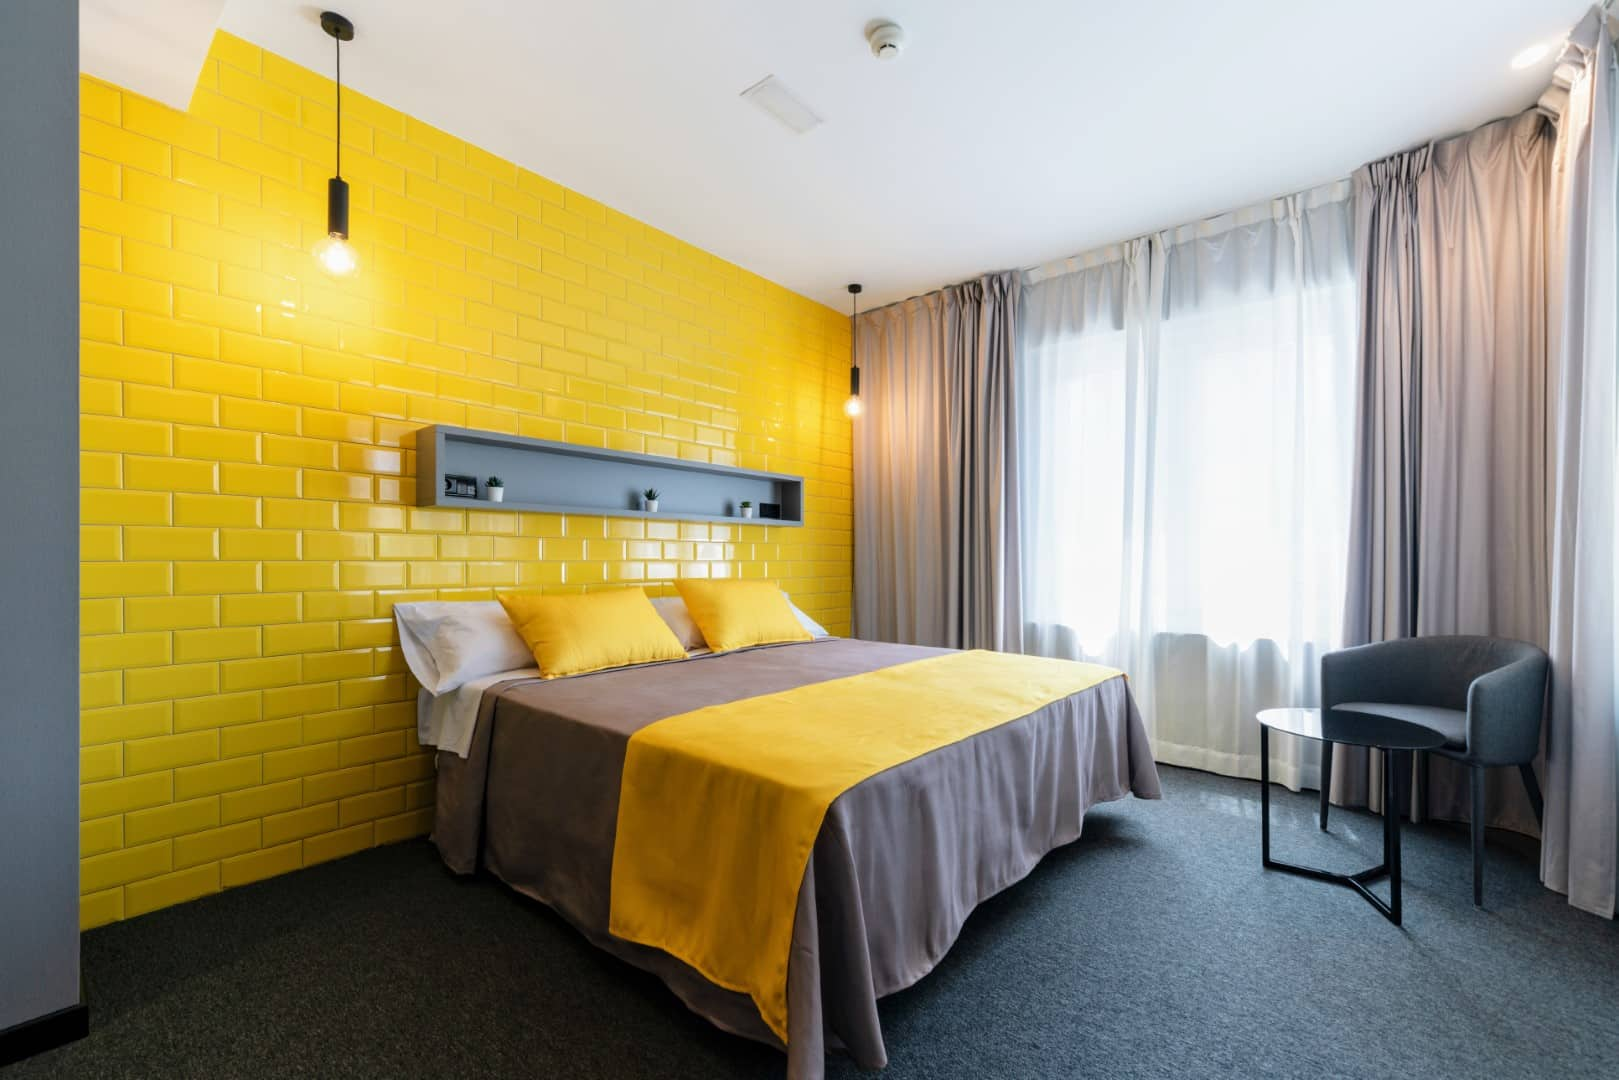 Nest Style Valencia Hotel